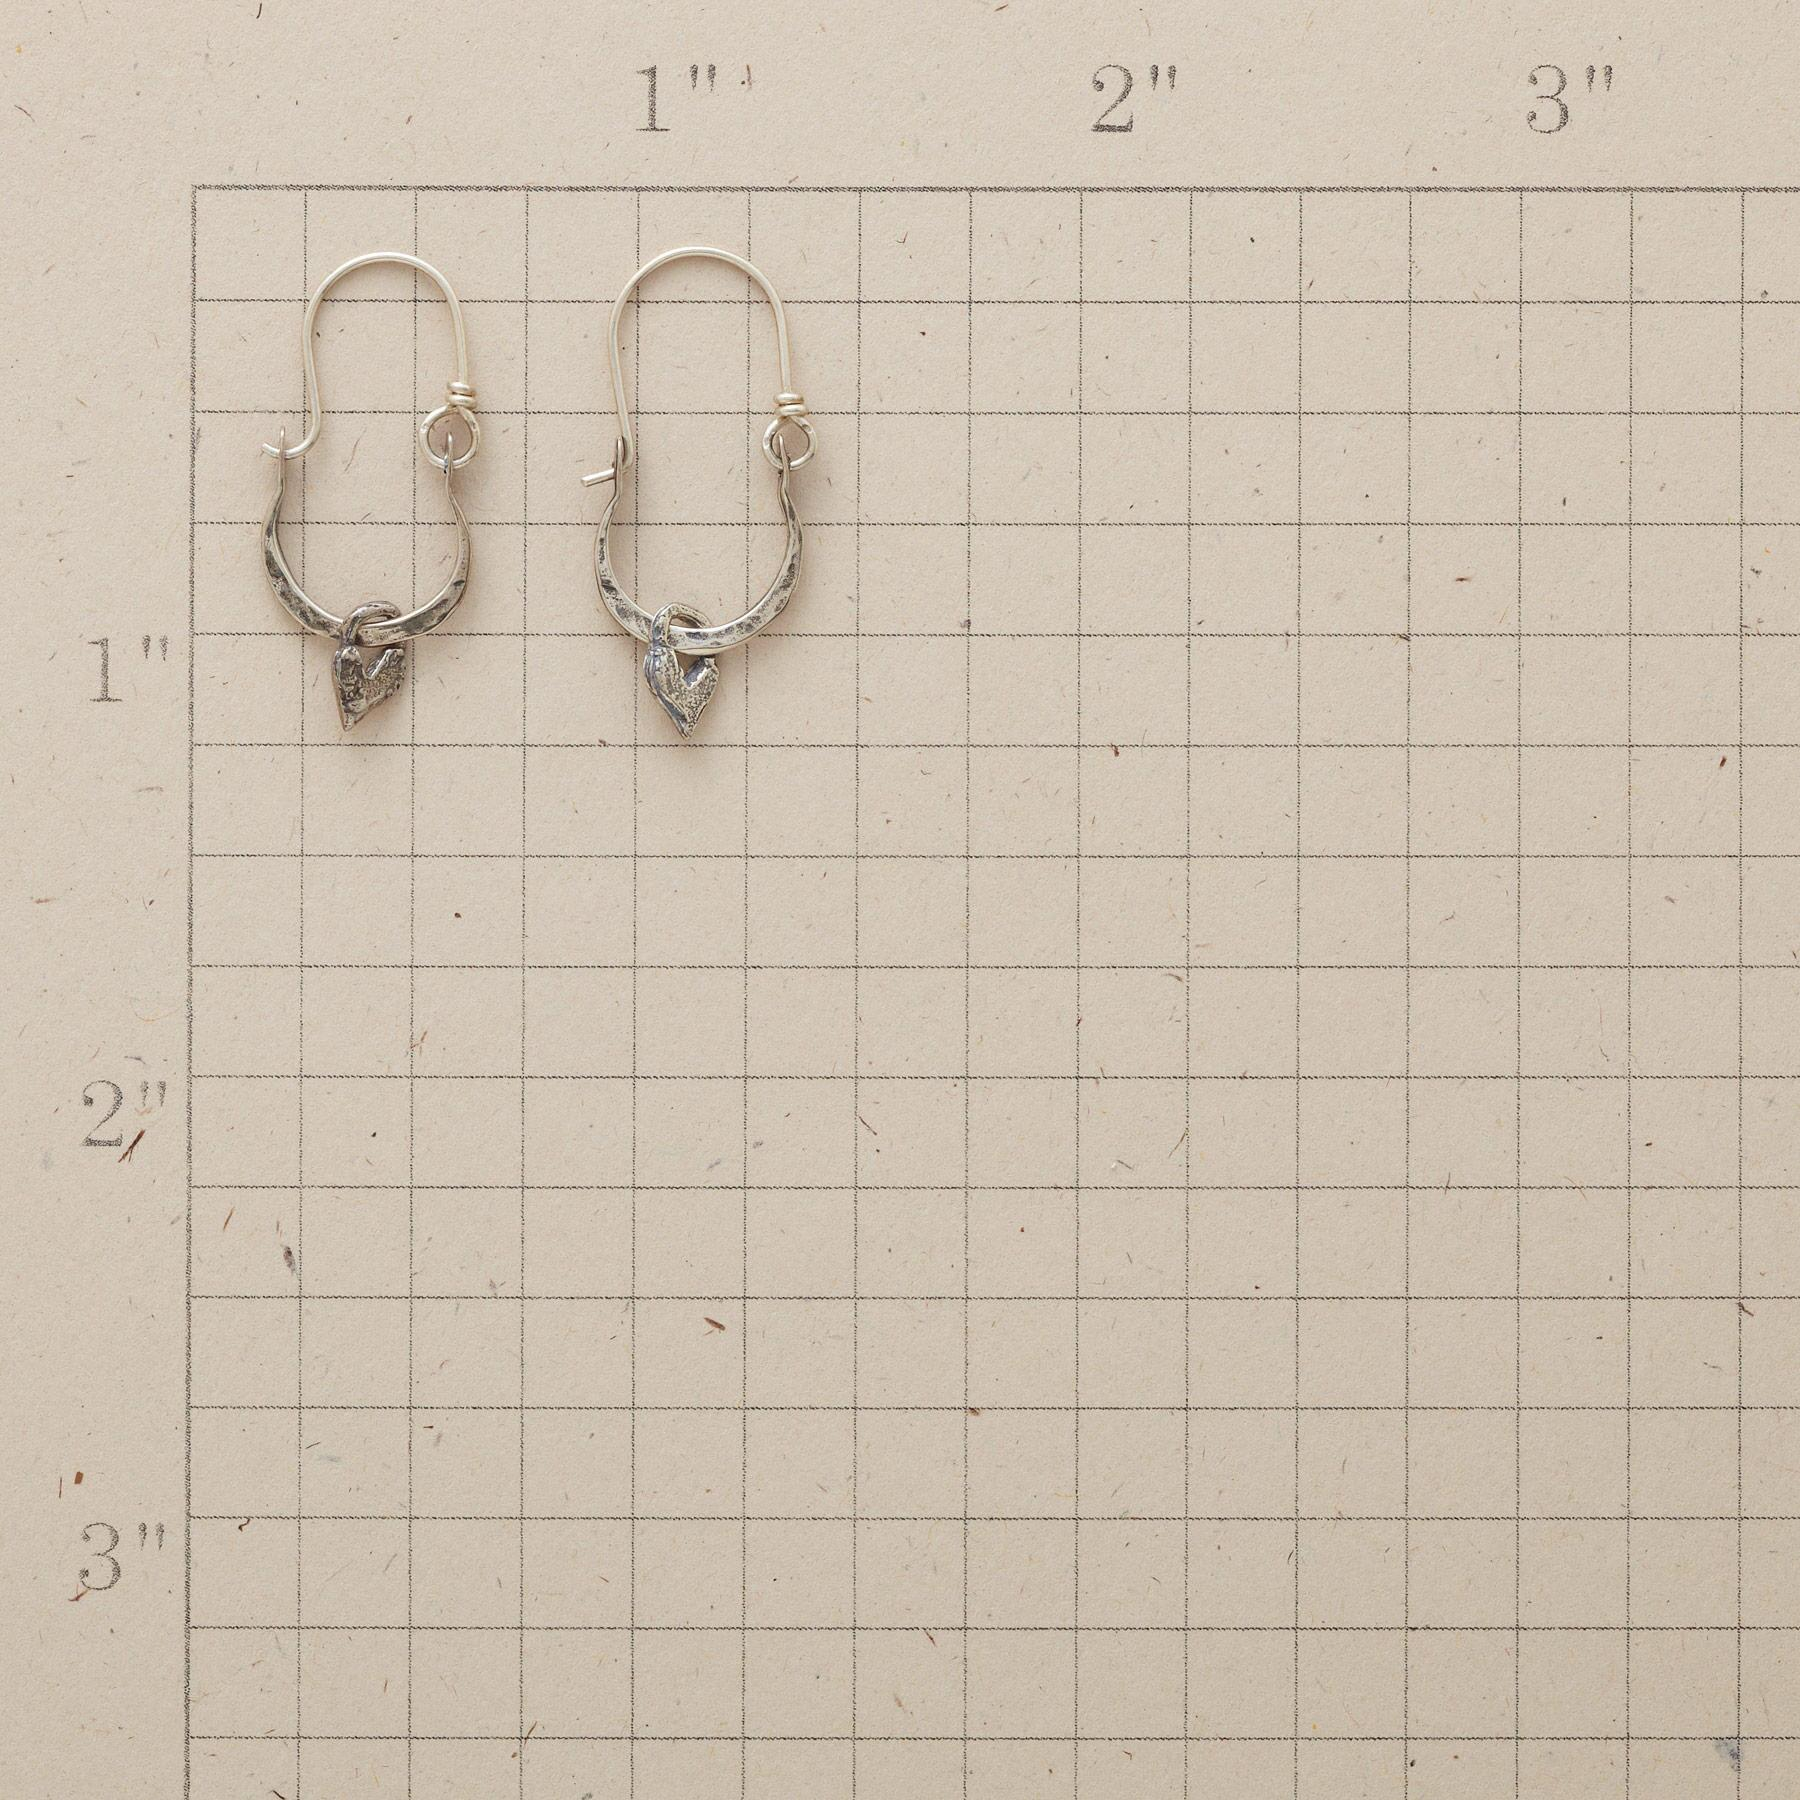 STERLING SILVER BELLA EARRINGS: View 2